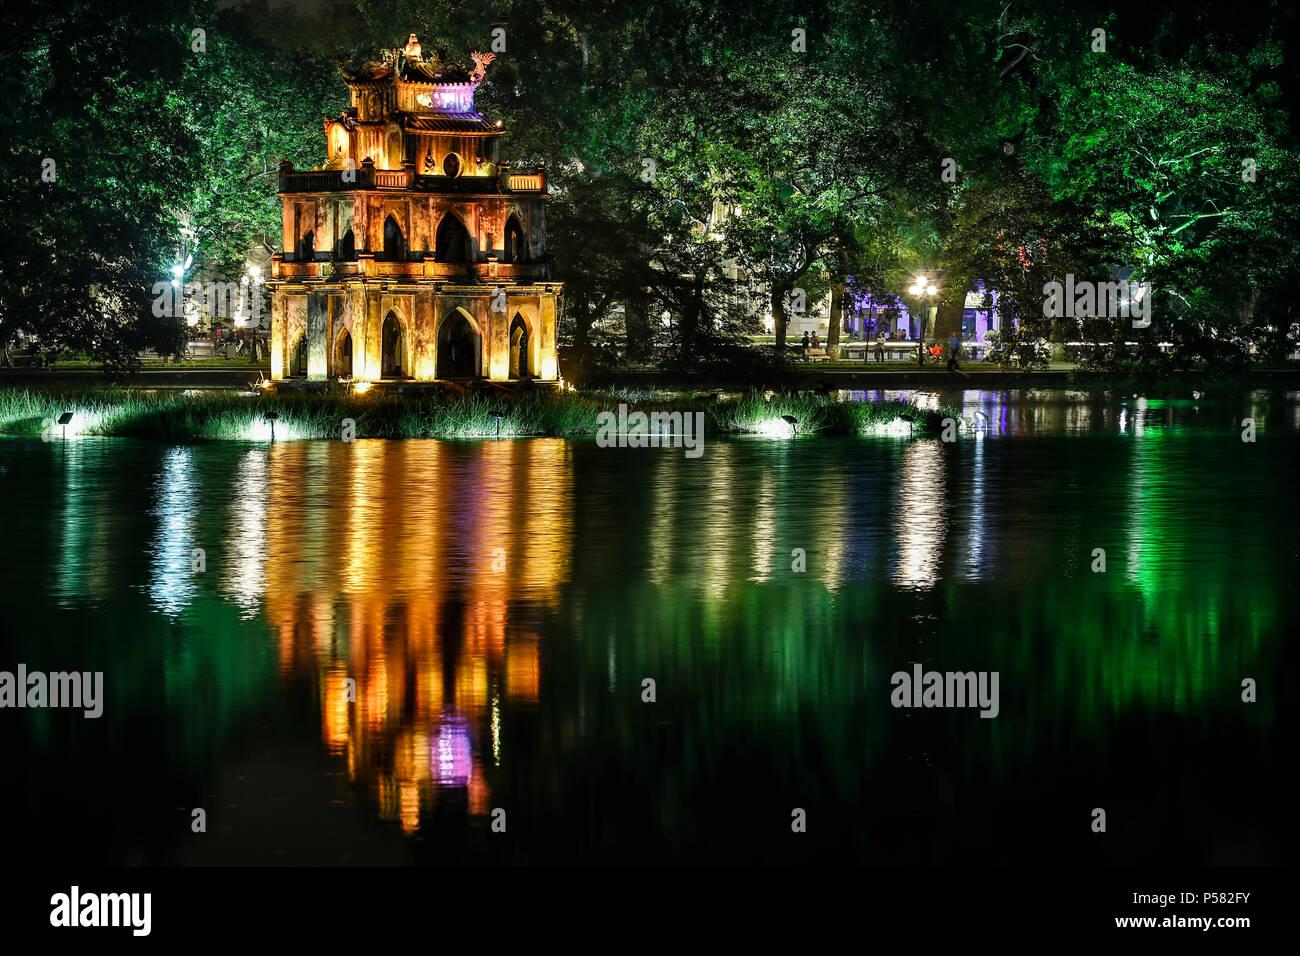 Turtle Tower, Hoan Kiem Lake, Hanoi, Vietnam - Stock Image